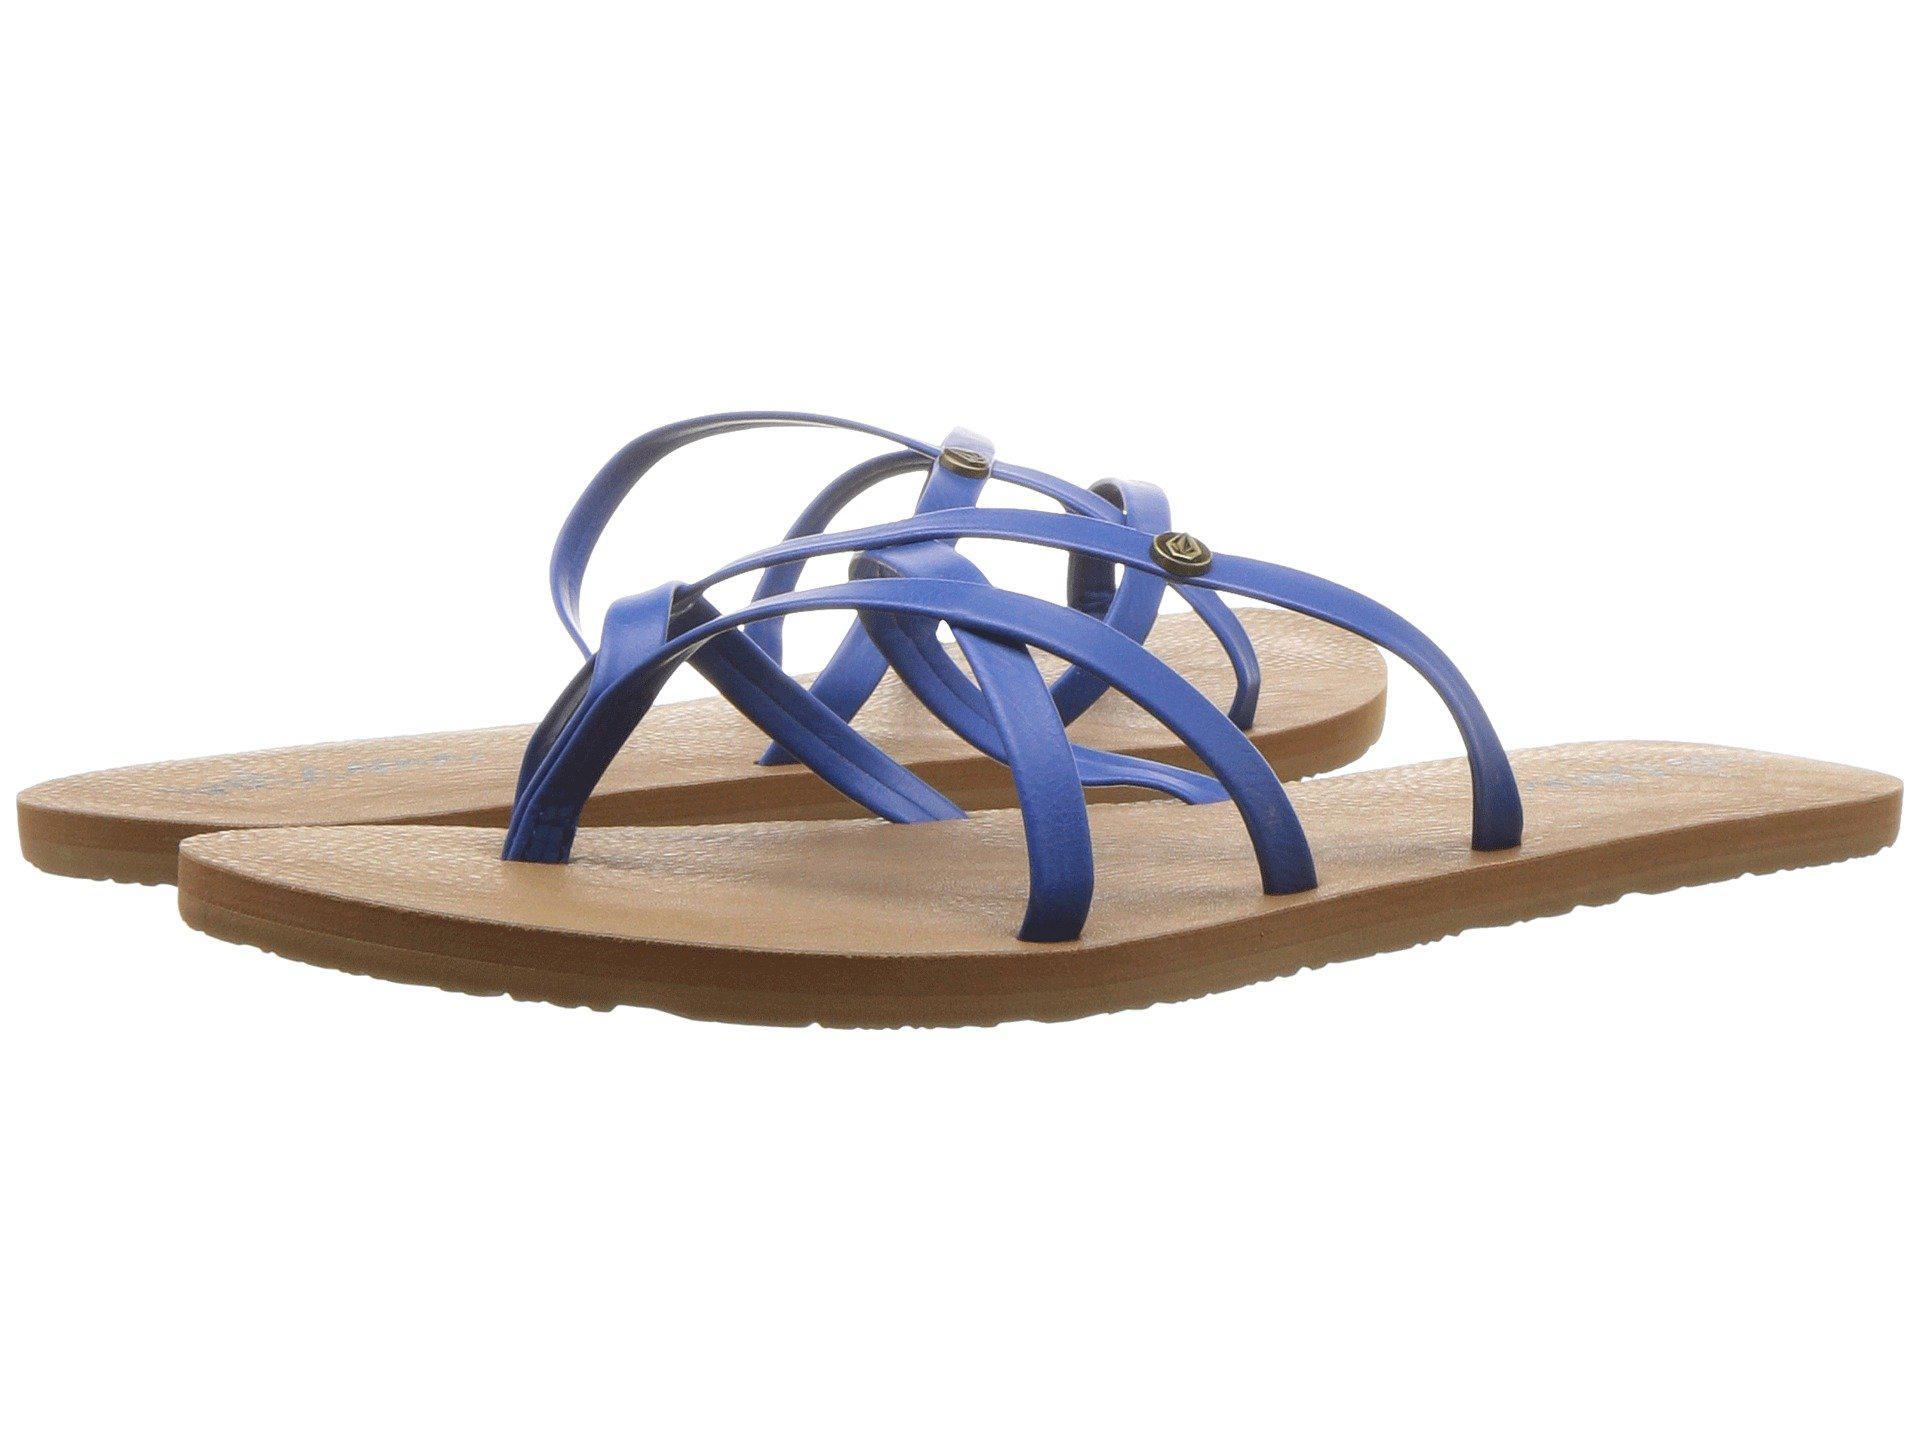 473bfe192 Lyst volcom new school brown womens sandals in blue jpg 1920x1440 Volcom  new school grey